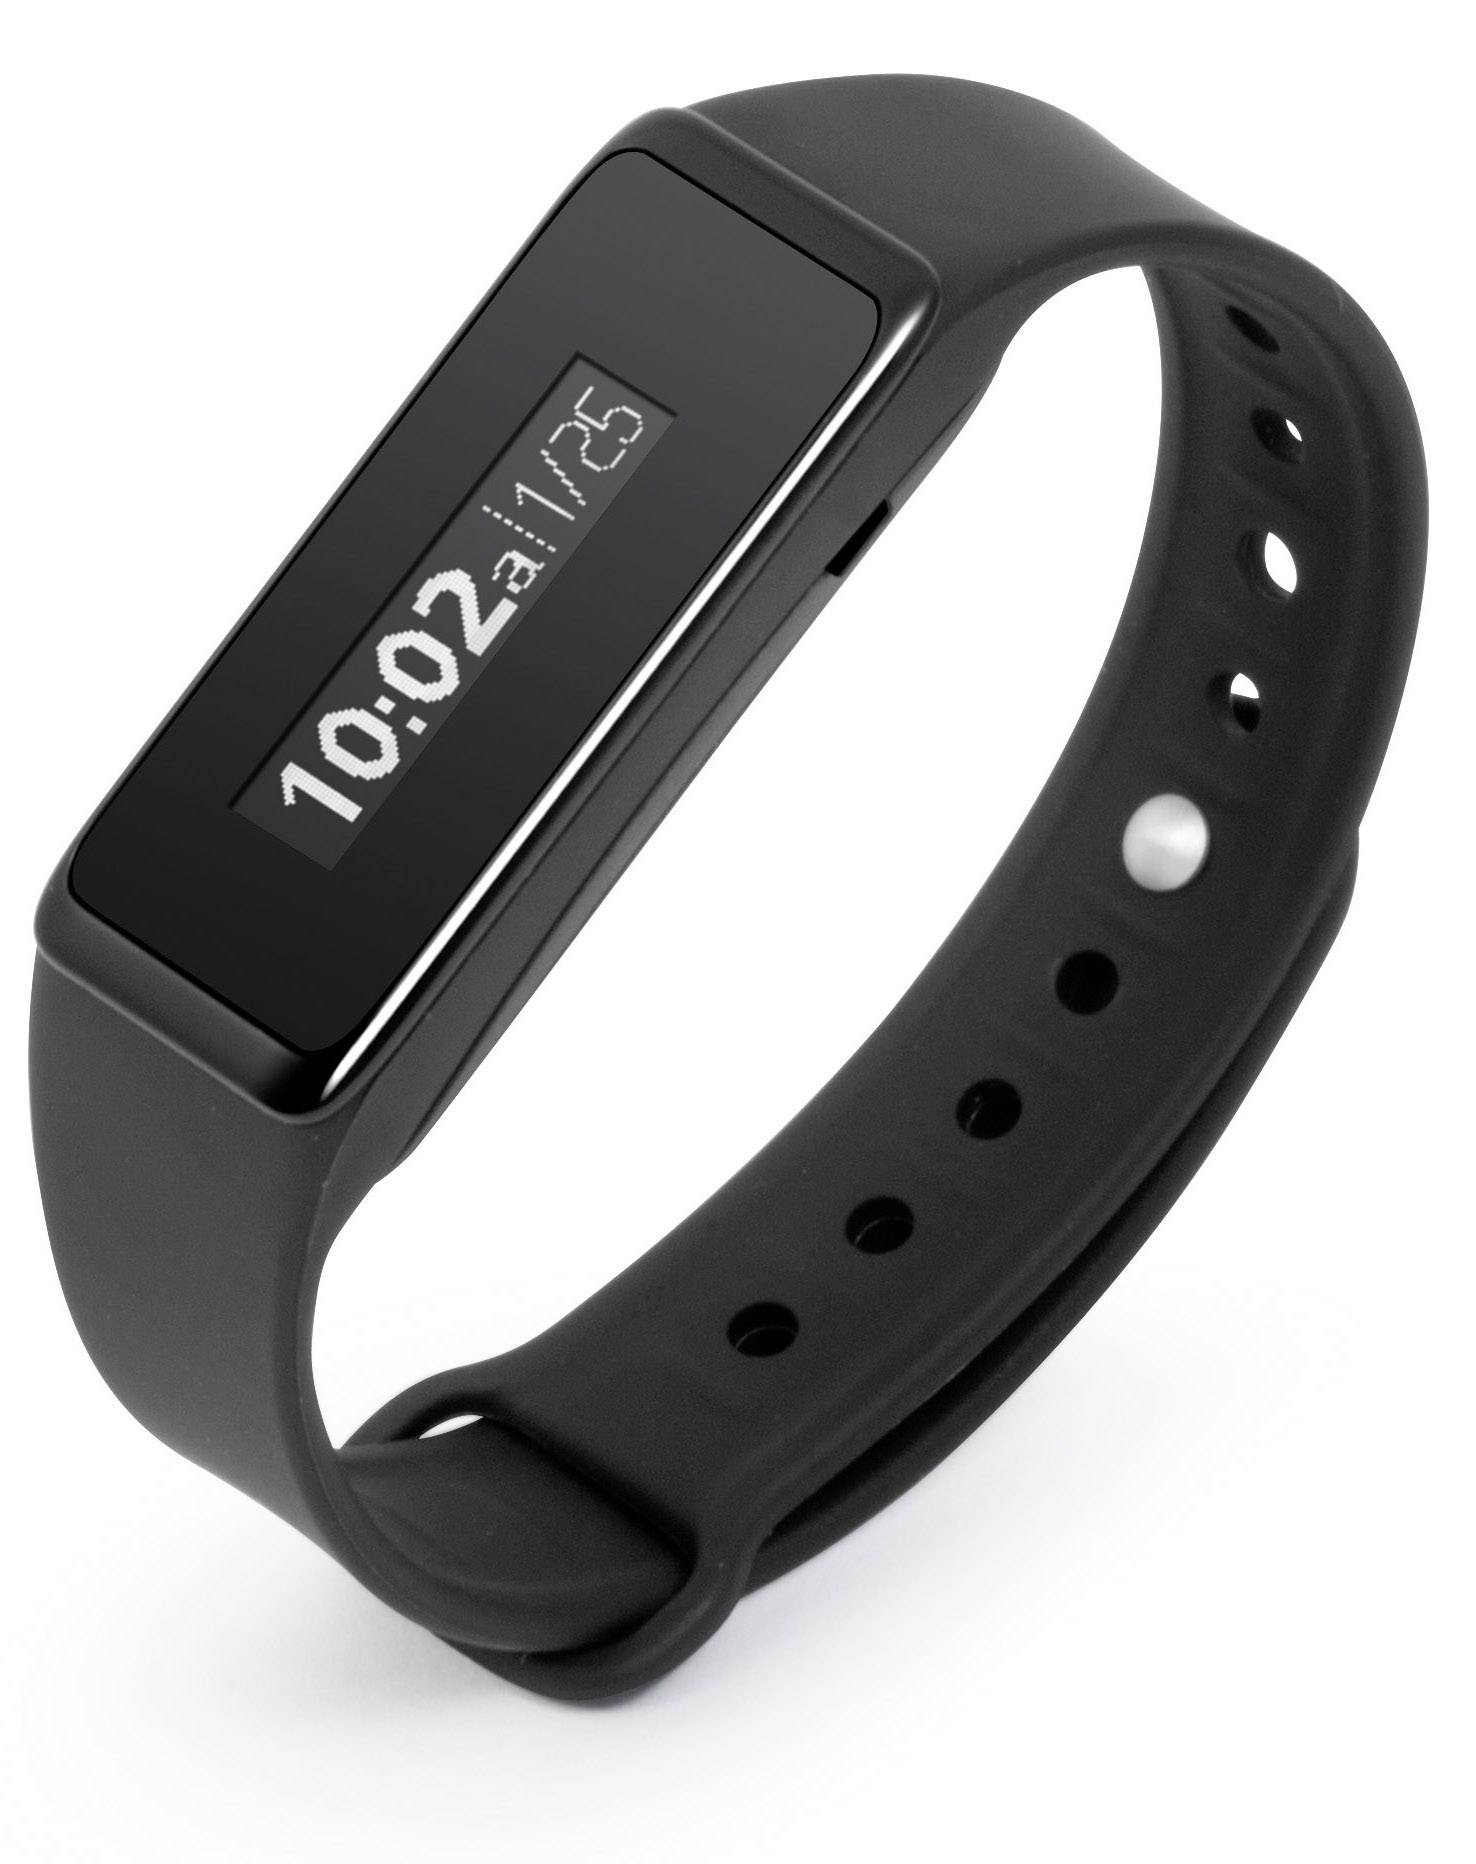 Bracciale Fitness Bluetooth 4.0 BLE, TX-72